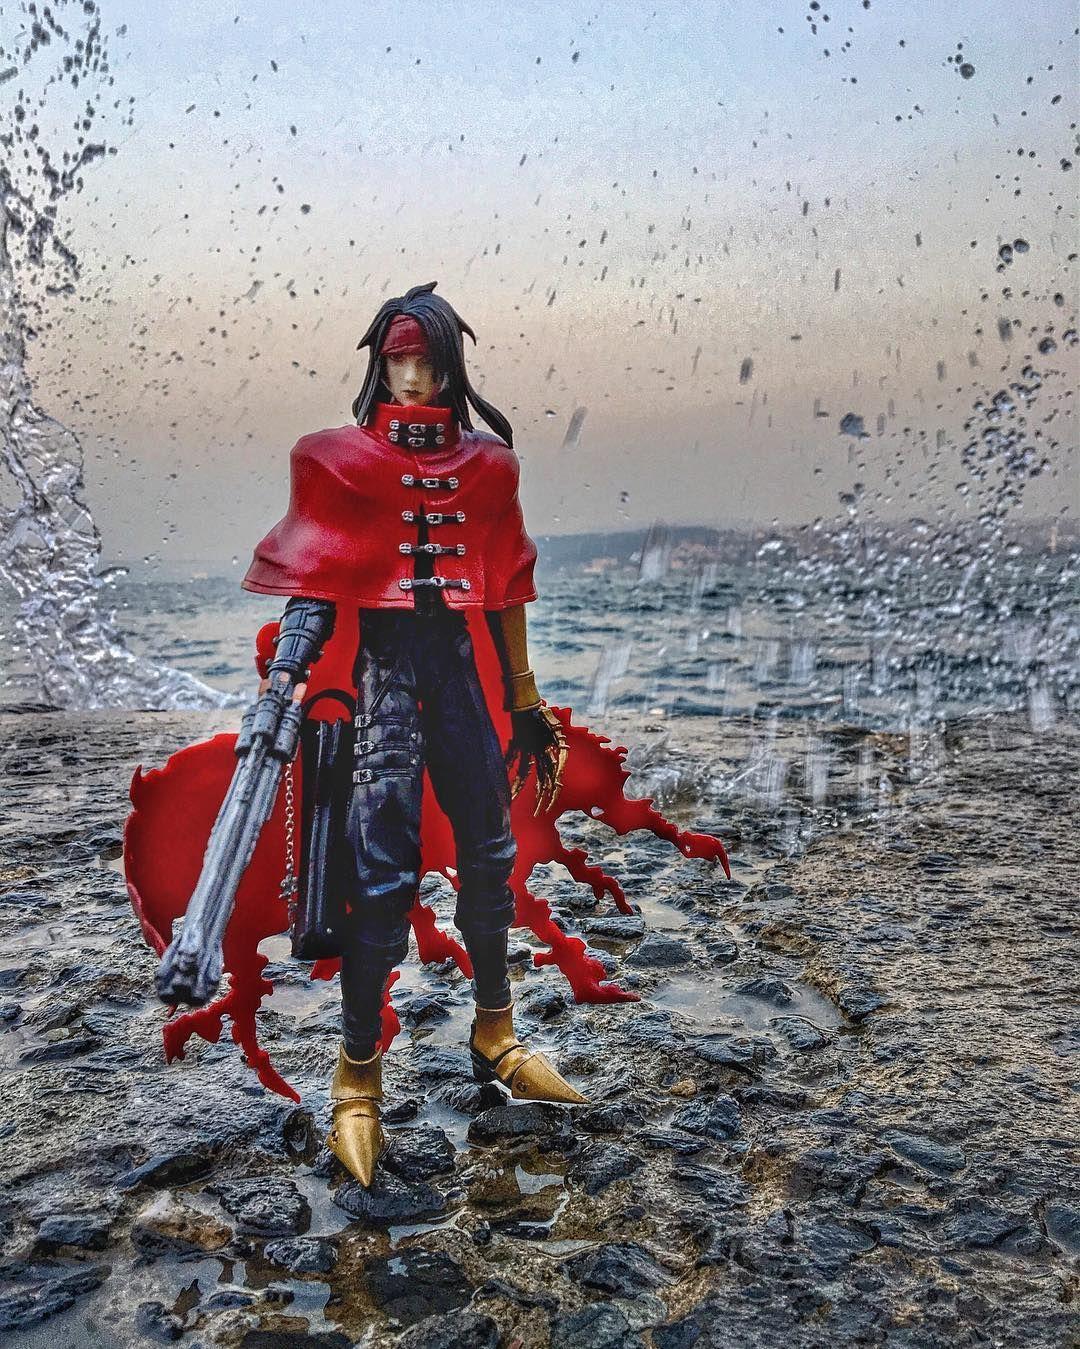 Prince of tides... #finalfantasy #finalfantasy7 #adventchildren #vincentvalentine #squareenix